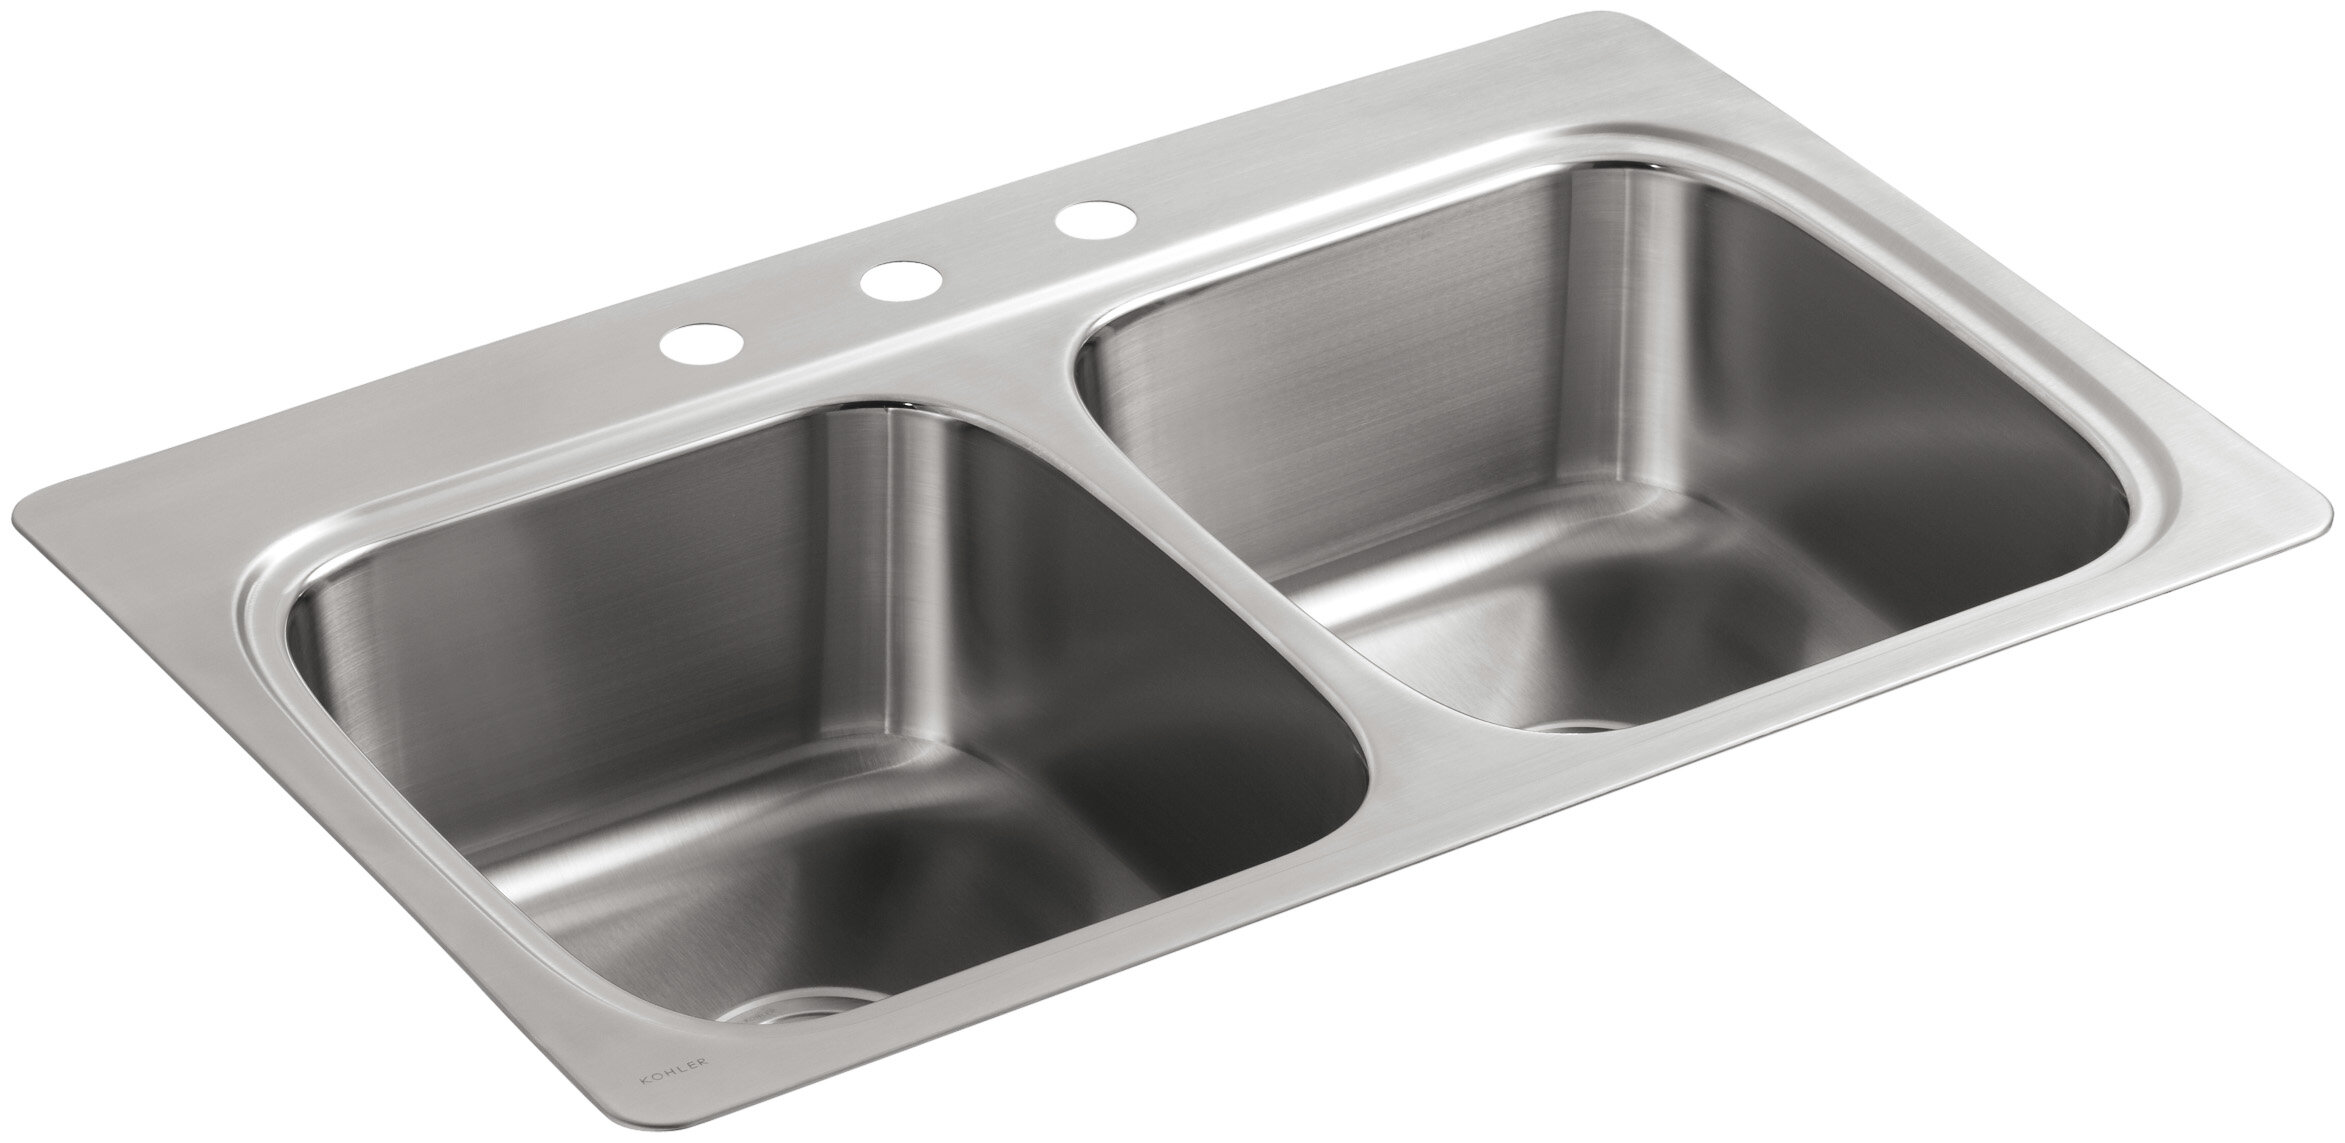 K 5267 3 Na Kohler Verse Top Mount Double Equal Bowl Kitchen Sink With 3 Faucet Holes Wayfair